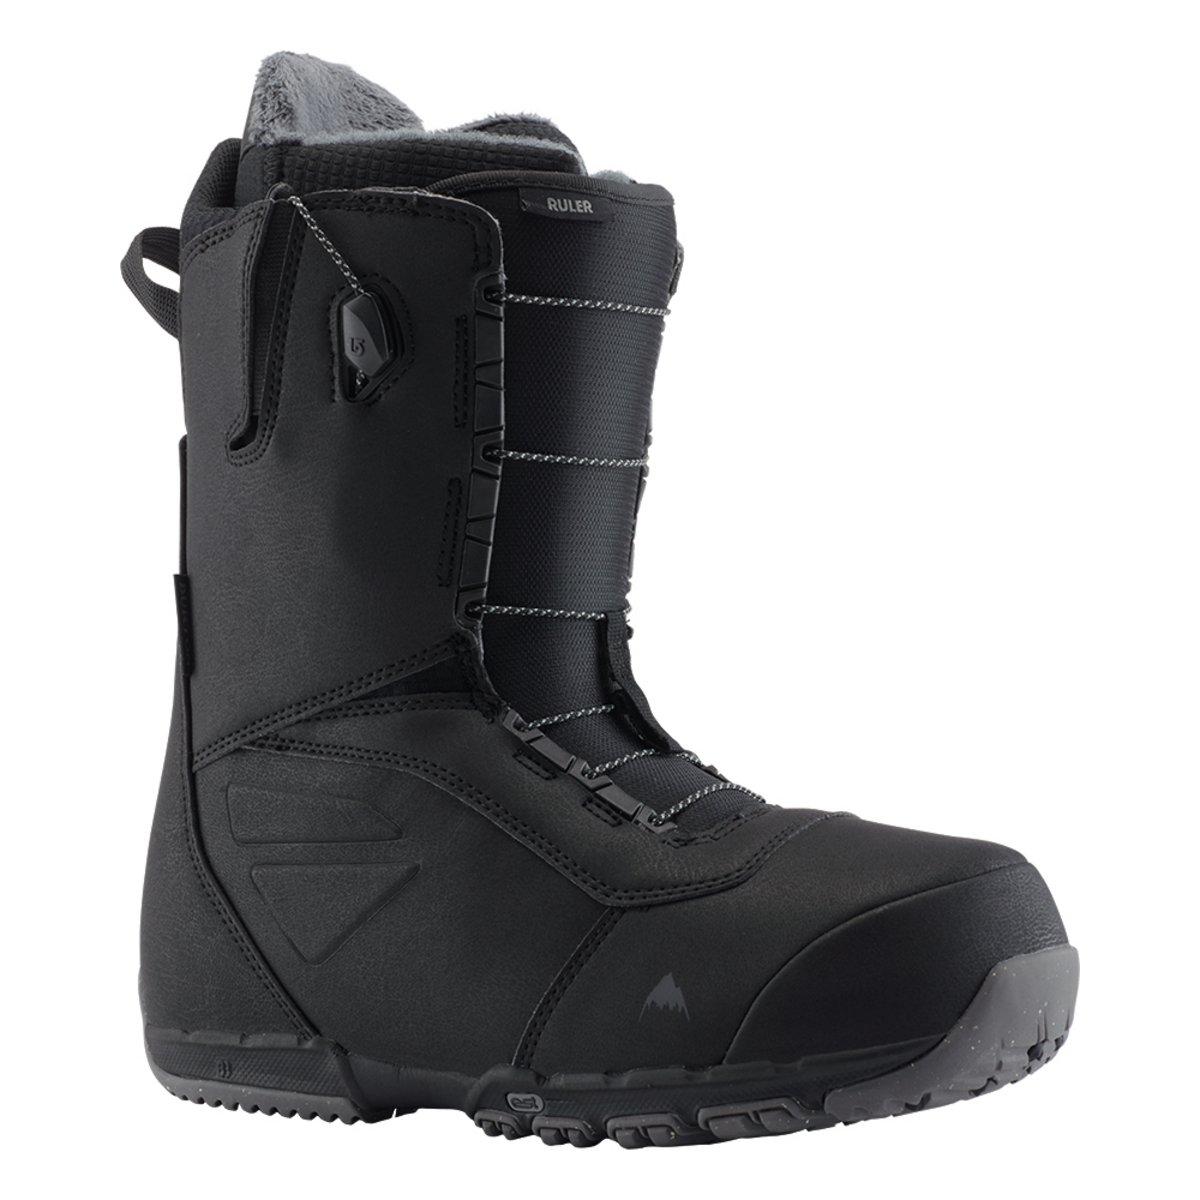 Burton Men's Ruler Snowboard Boots 2019 / 2020 0